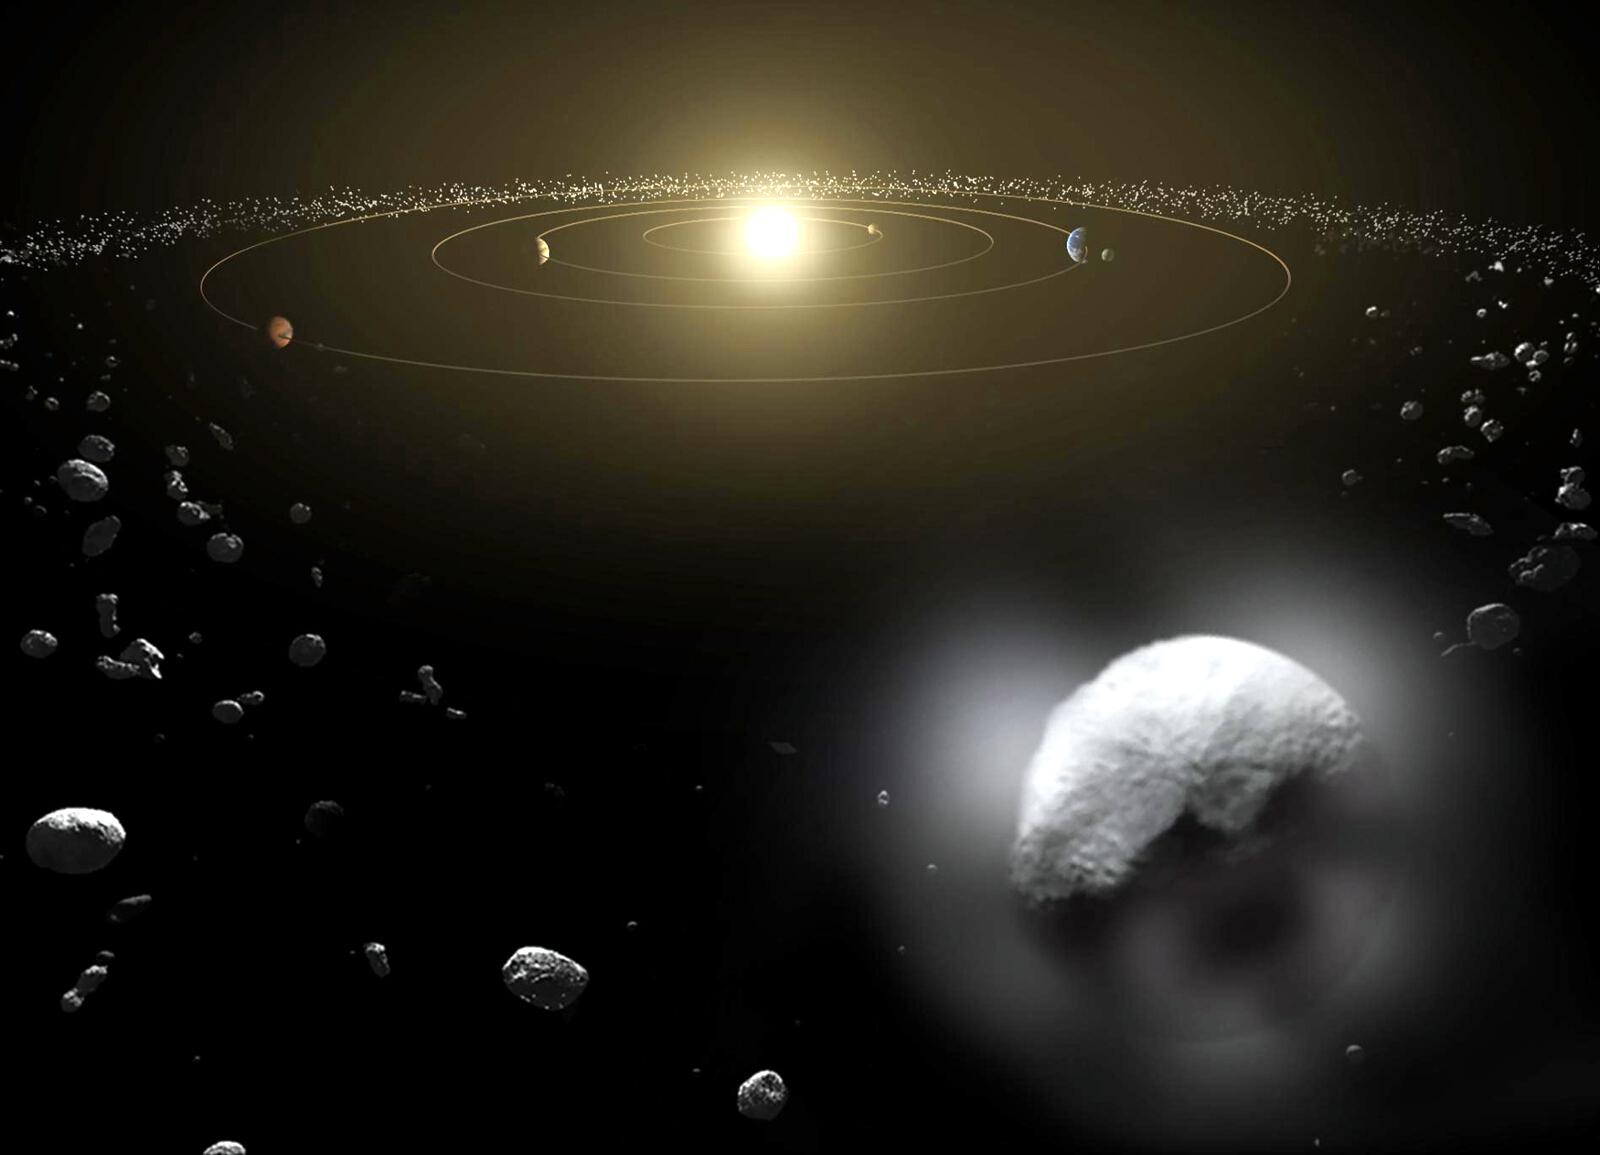 Nasa Exoplanets Kepler 9